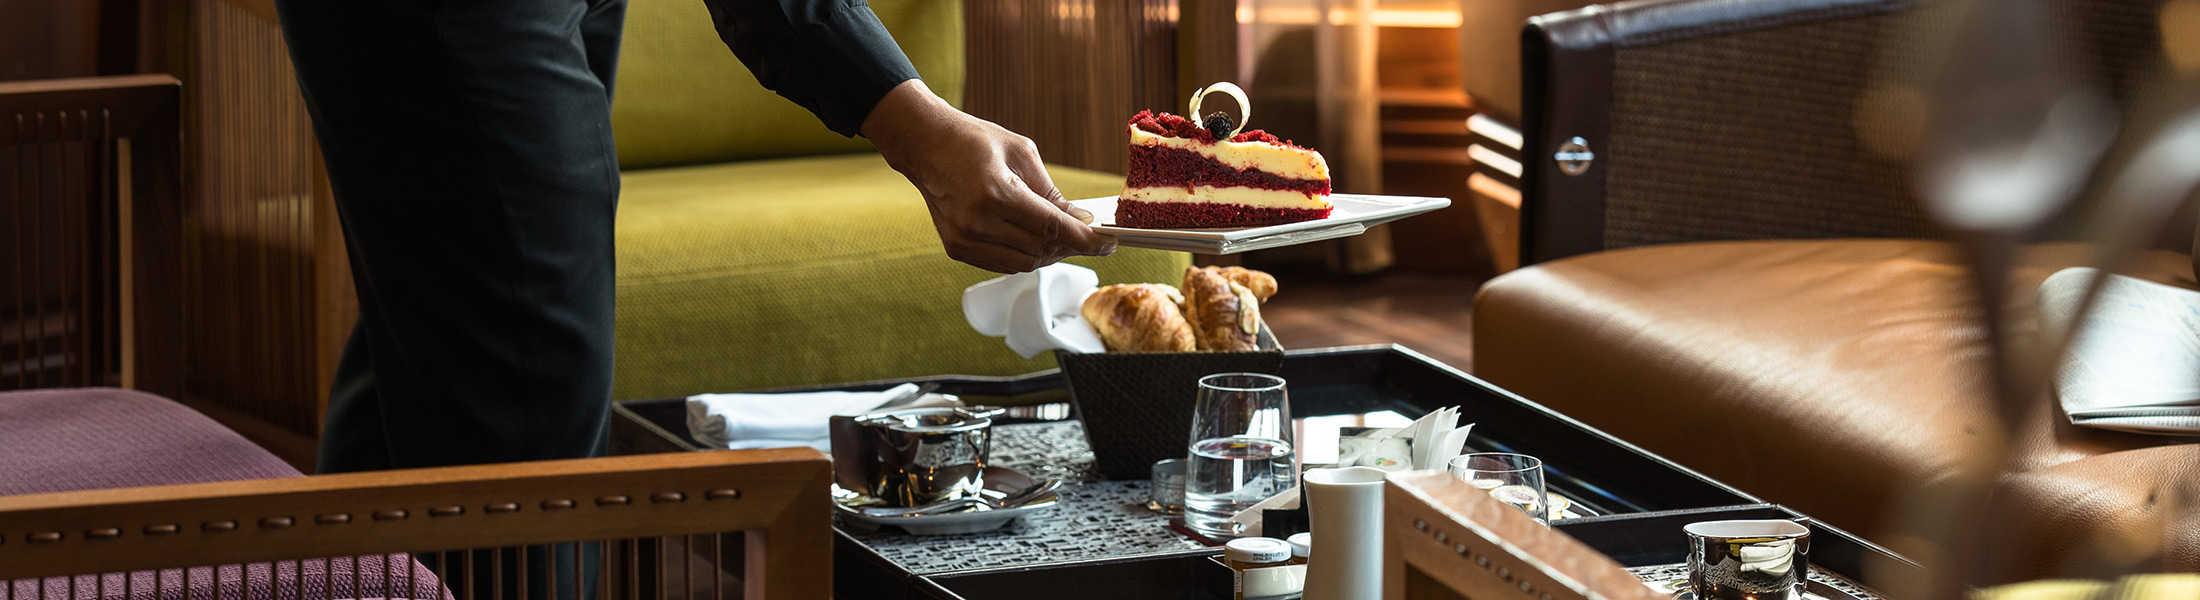 Afternoon tea at Jumeirah Creekside Hotel